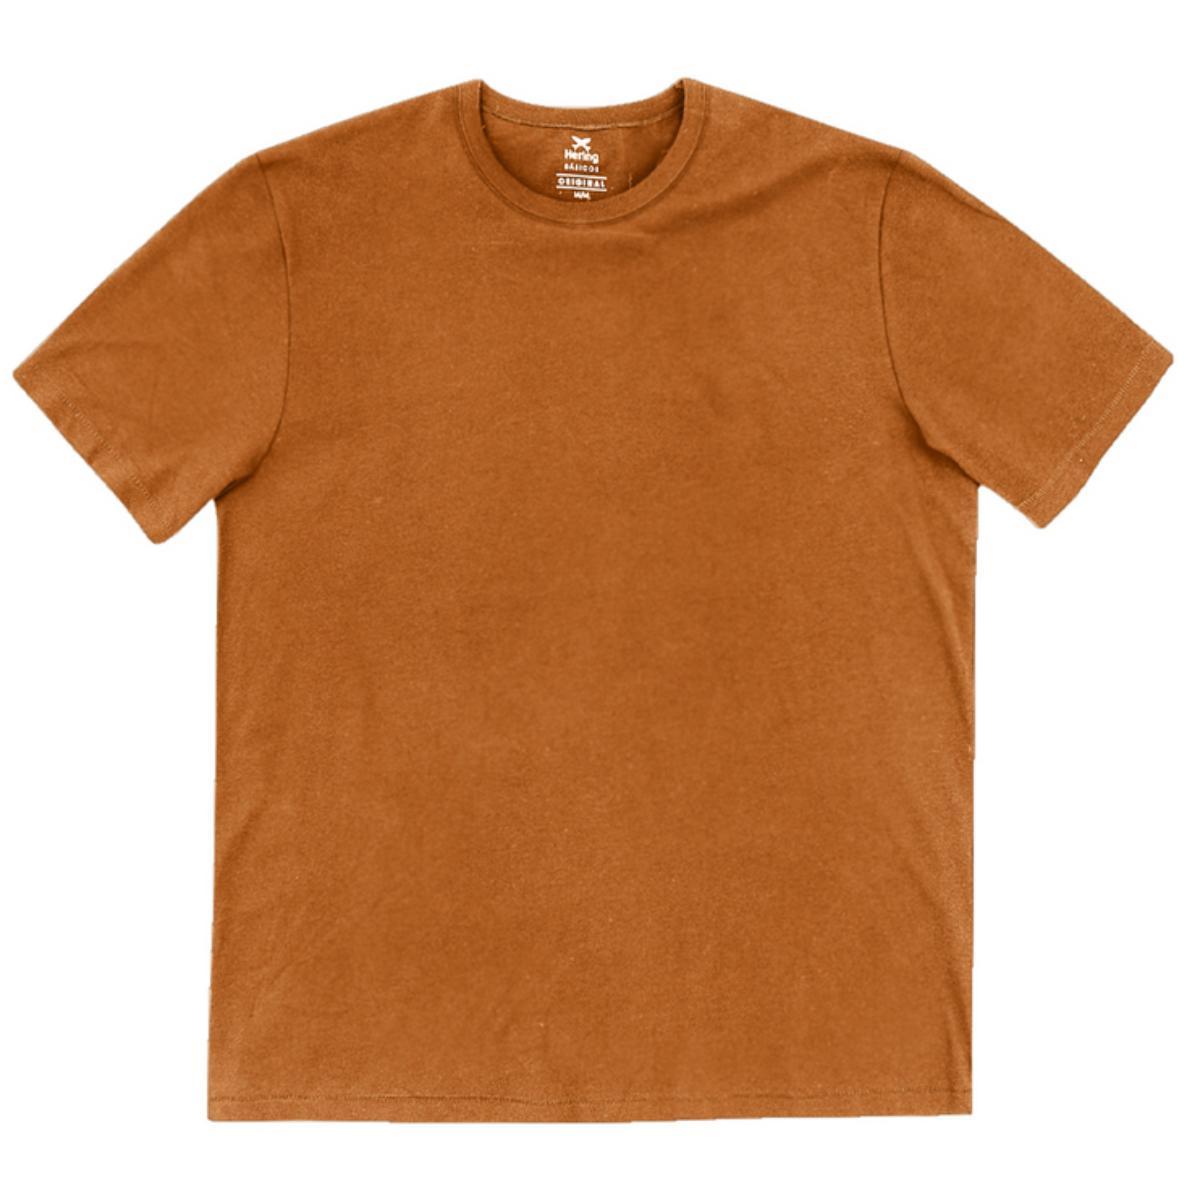 Camiseta Masculina Hering 0299 Yufen Telha